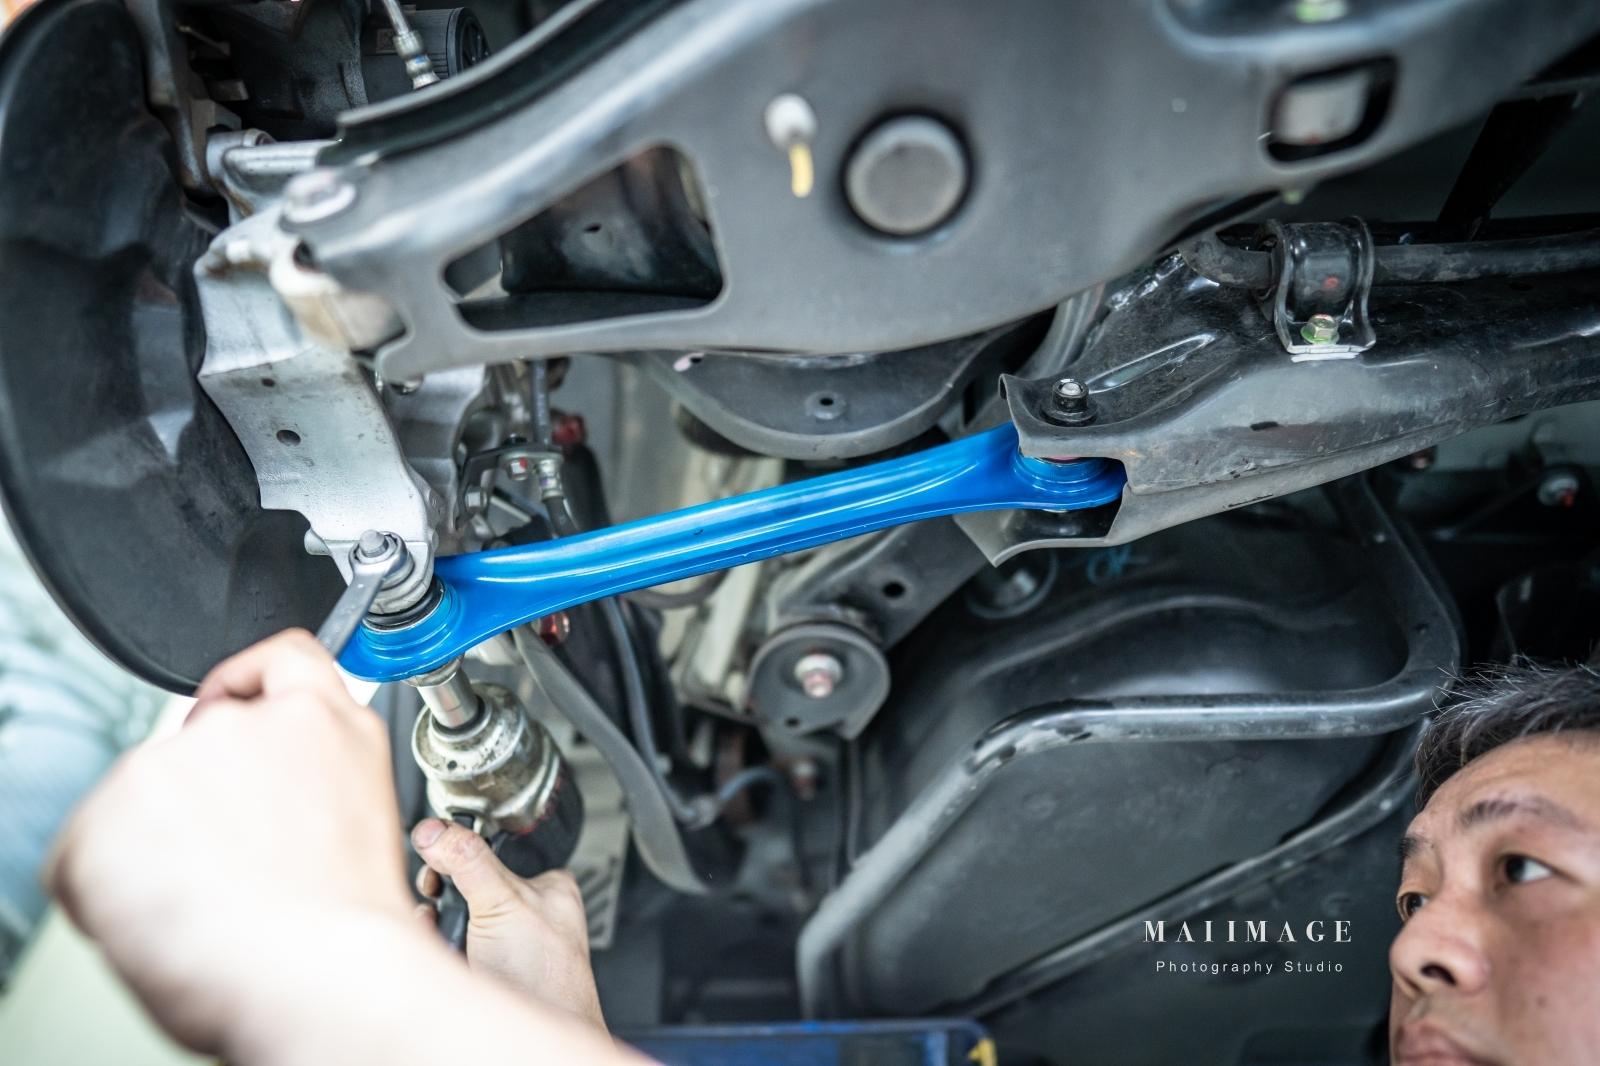 HONDA CR-V休旅車小改裝分享。改車這種事就是要交給專業的來,原廠零件改裝|板橋汽車改裝、板橋汽車保養